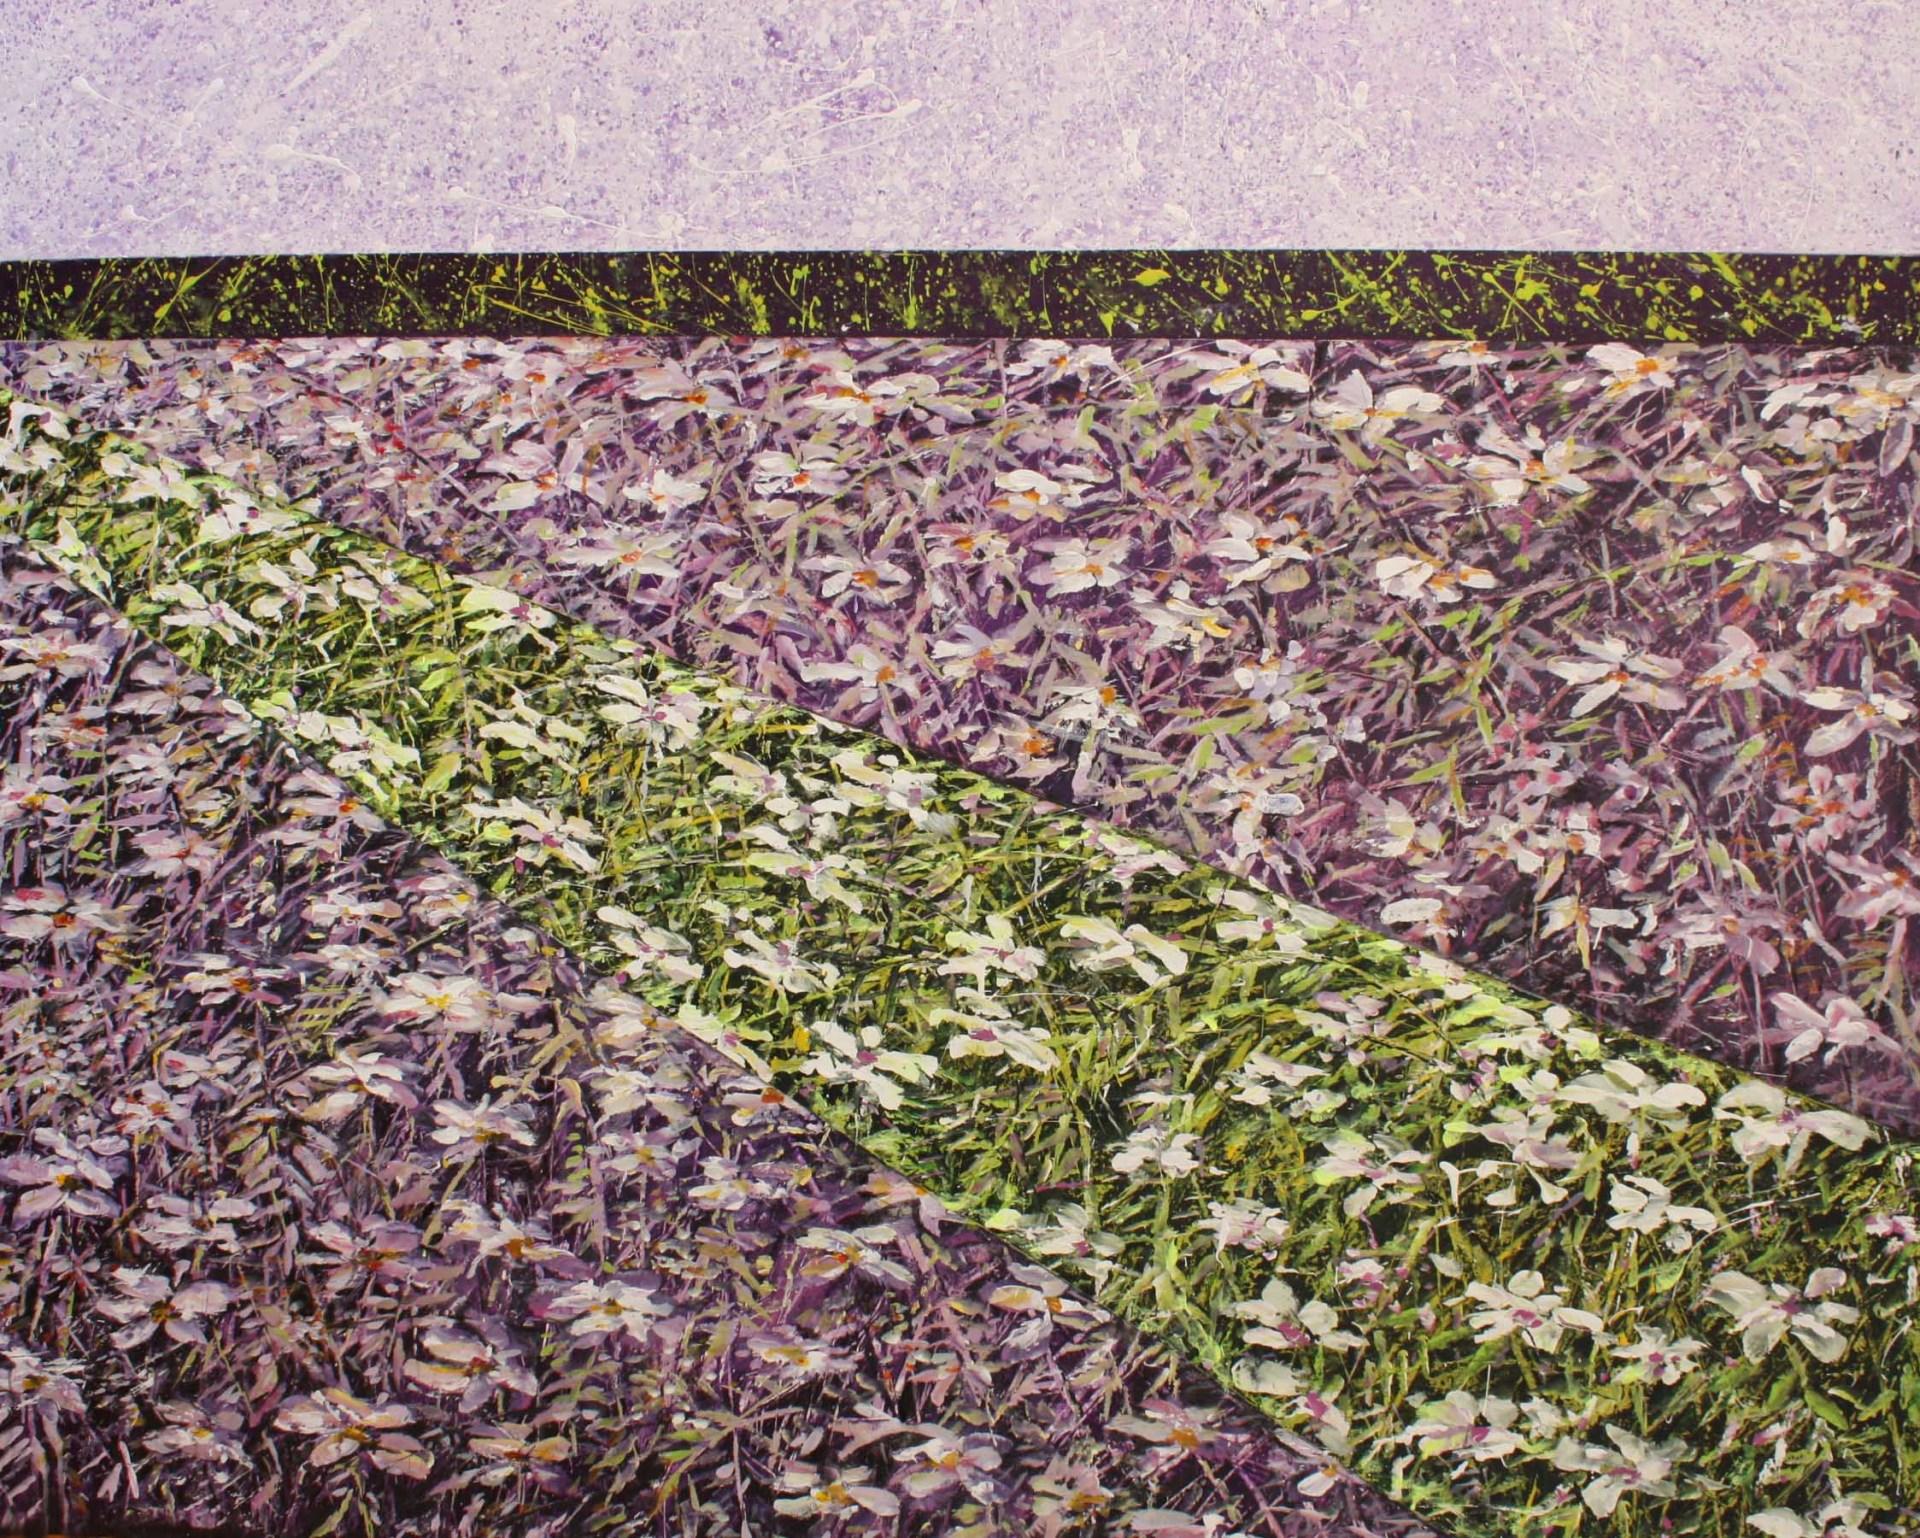 Daisies in purple field